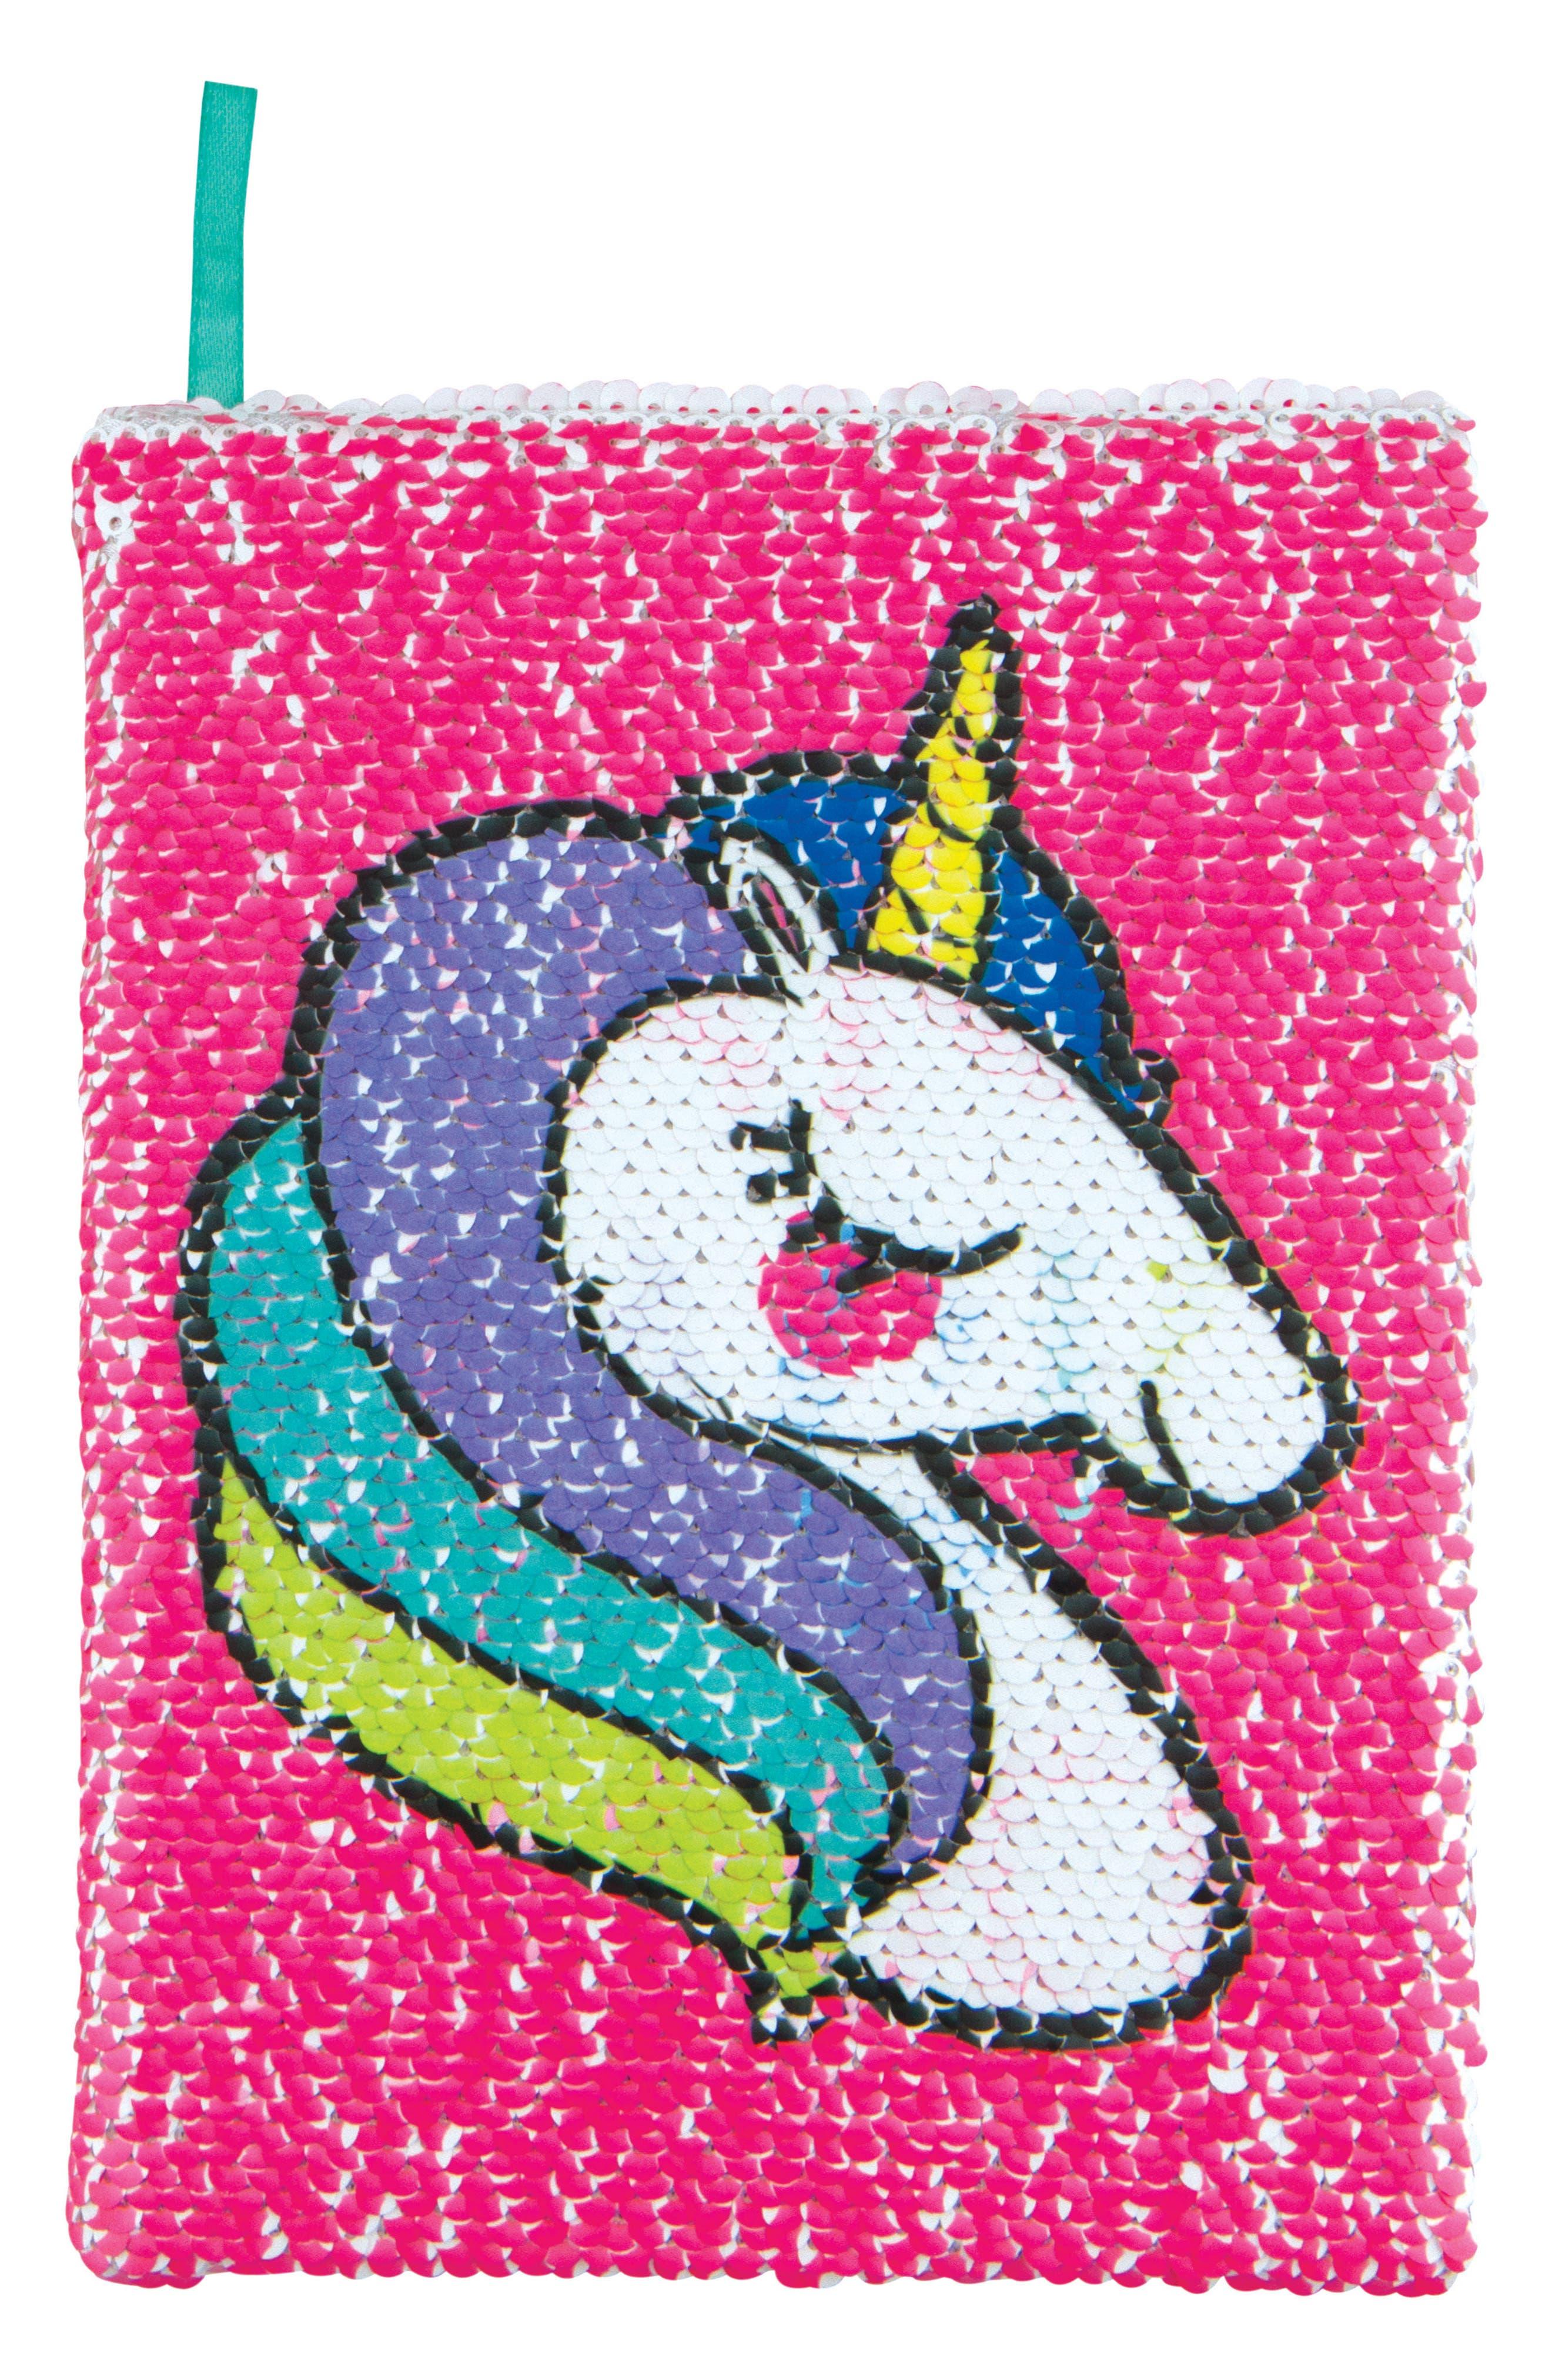 Unicorns Make Magic Happen Magic Sequin Reveal Journal,                             Main thumbnail 1, color,                             No Color